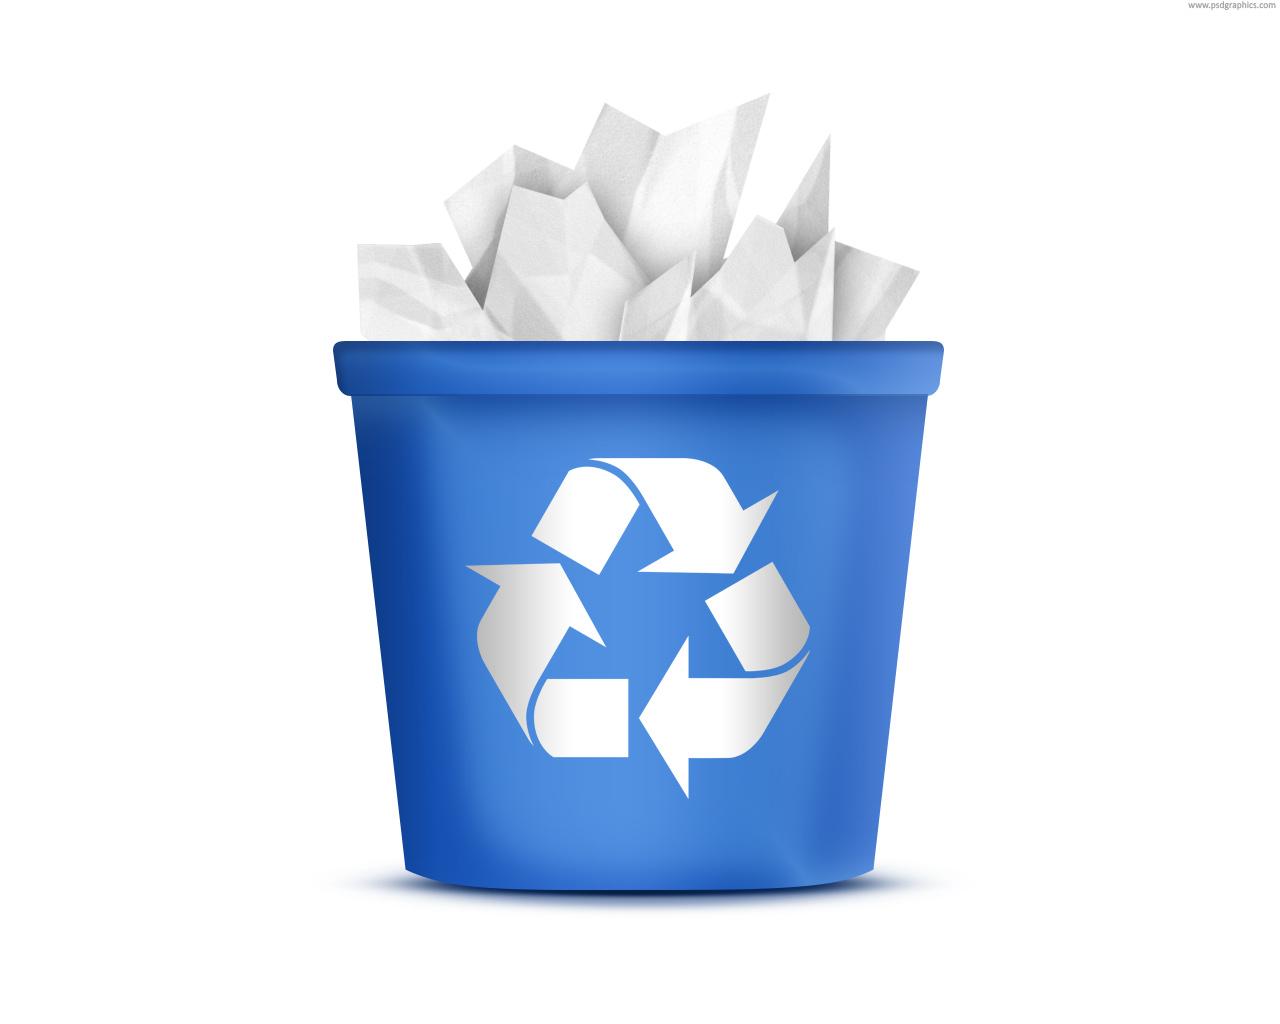 Clipart size windows 7 image free stock Windows 7 recycle bin clipart - ClipartFest image free stock